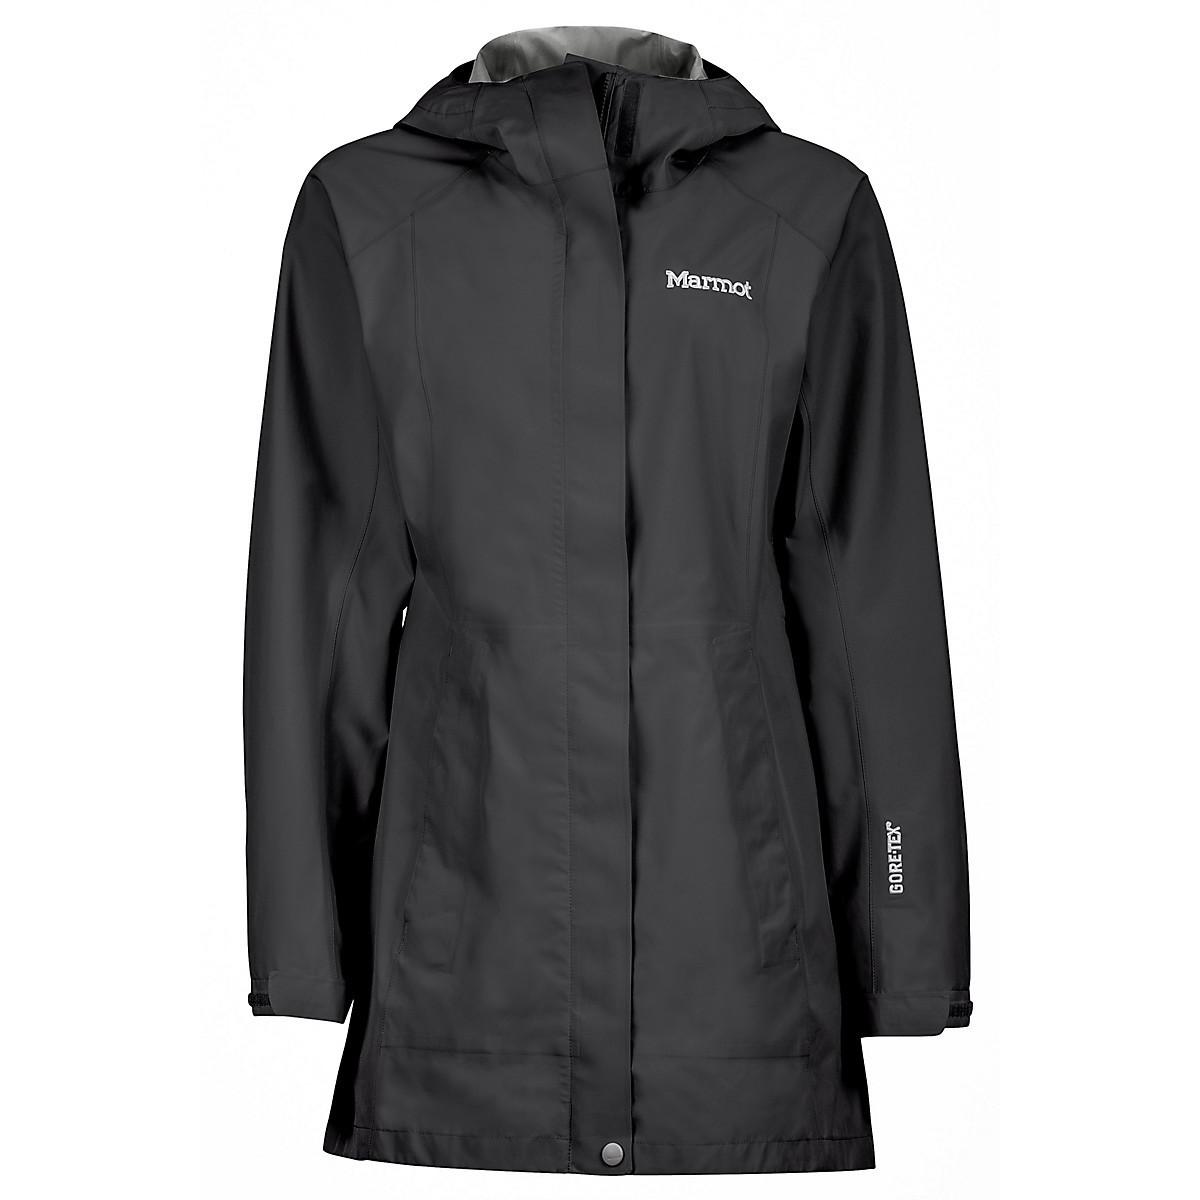 Marmot Women's Essential Jacket - Black, XS